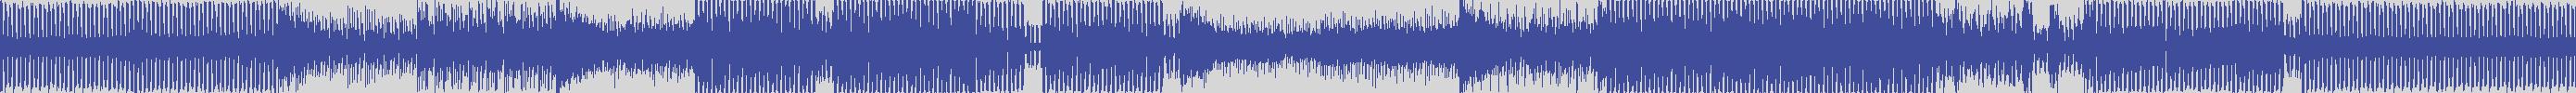 just_digital_records [JS1155] Jack Benassi - Odissea 3000 [Original Mix] audio wave form